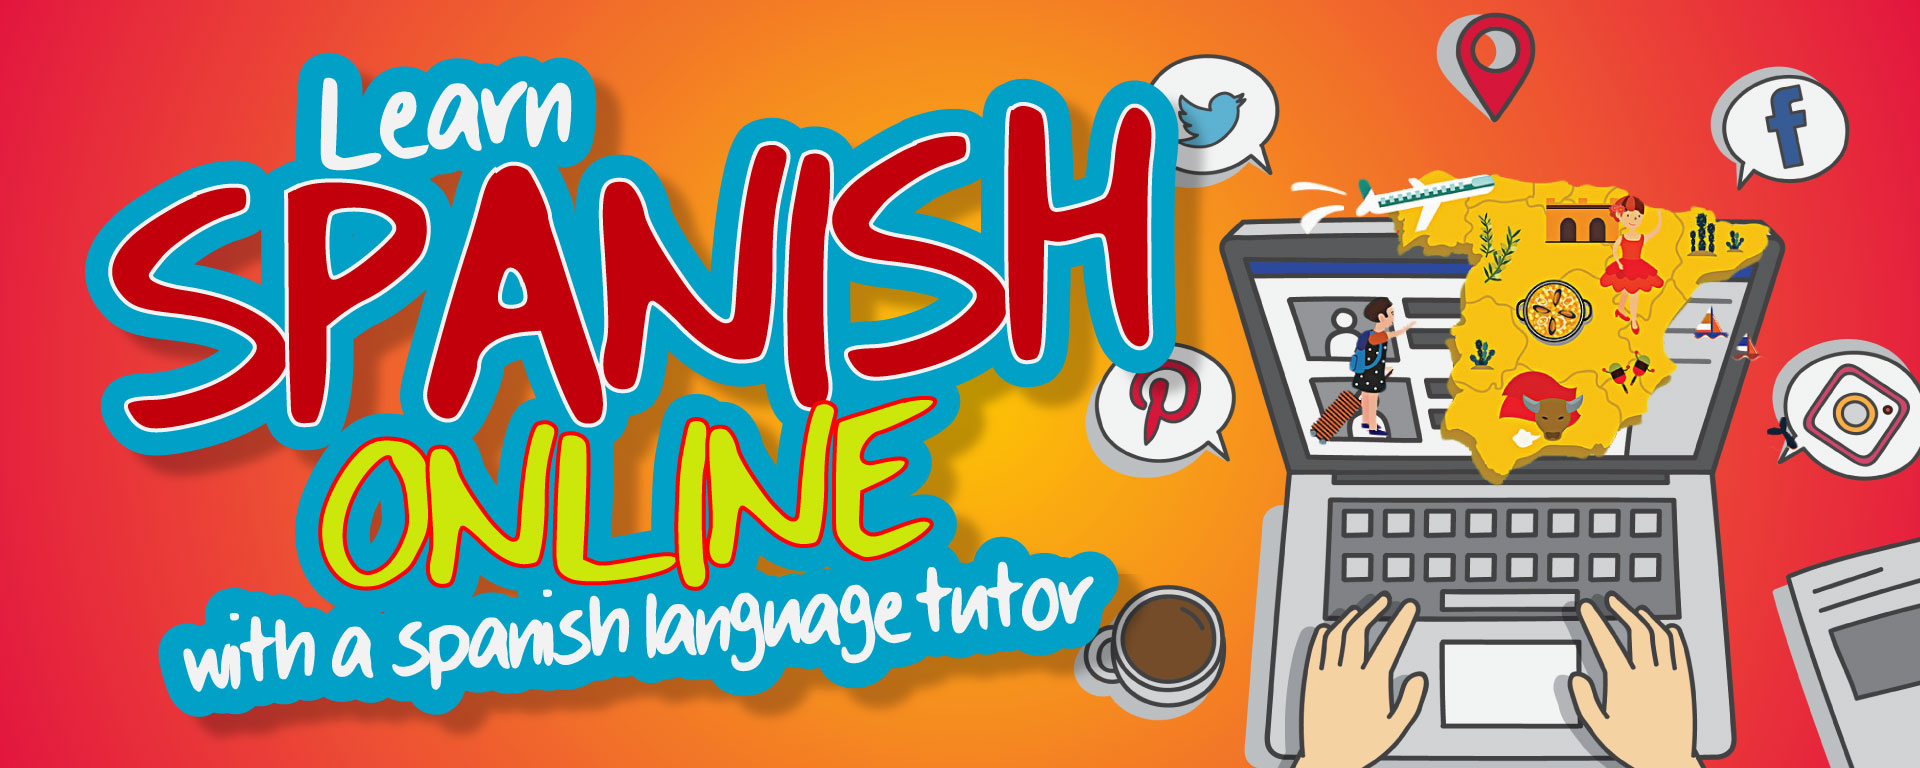 Workbooks spanish language workbooks : How to Learn Spanish Online with a Spanish Language Tutor